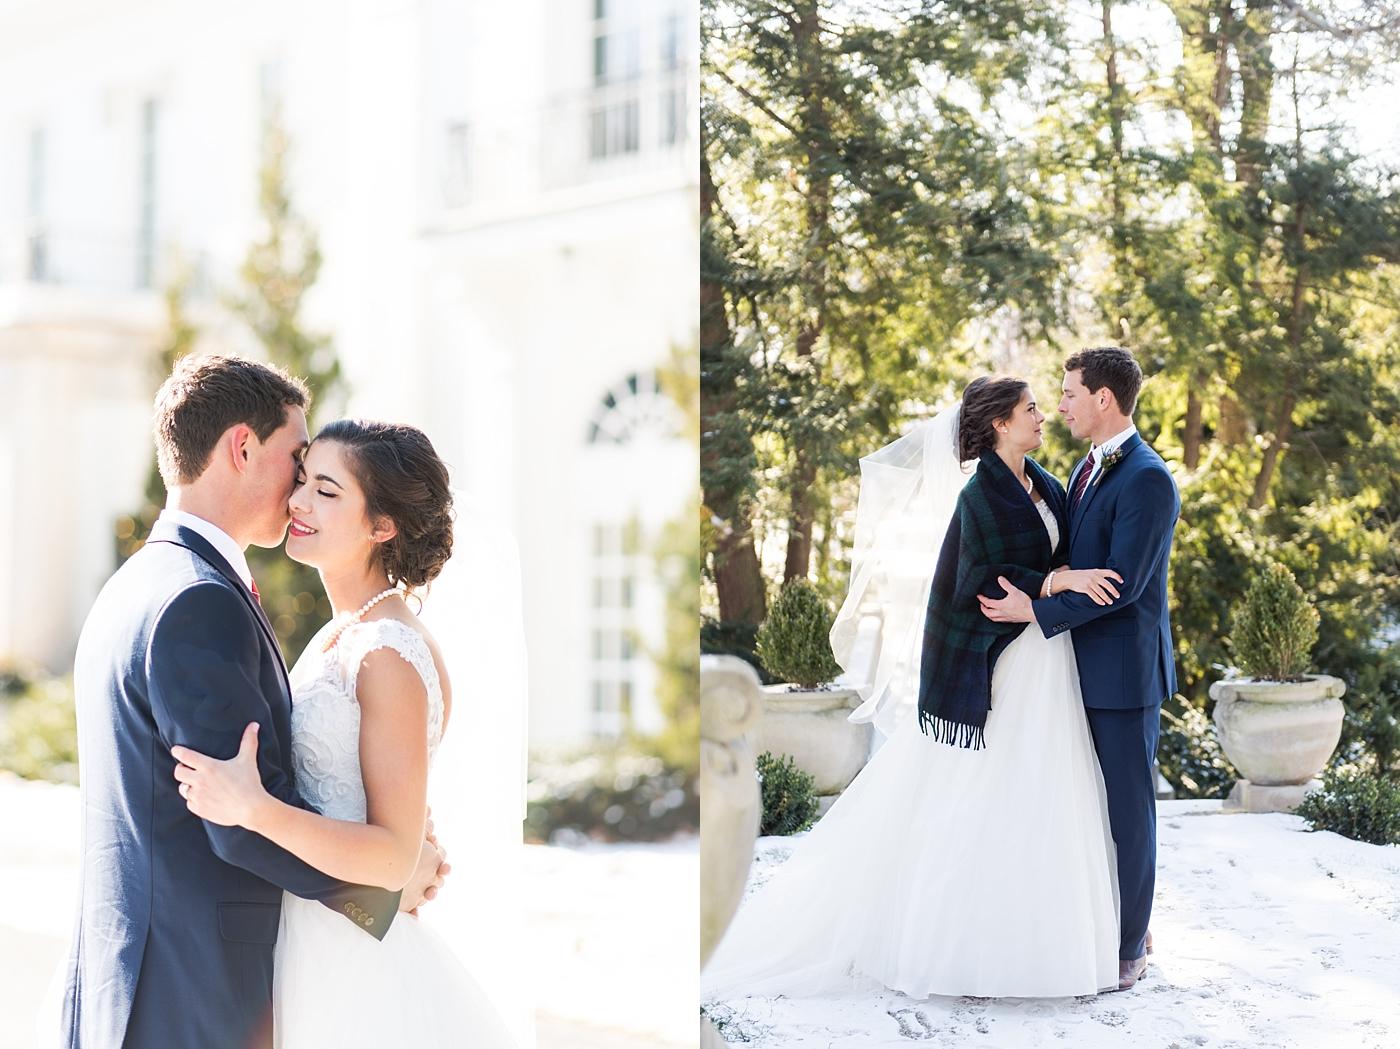 indianapolis-top-rated-wedding-photographers_0434.jpg